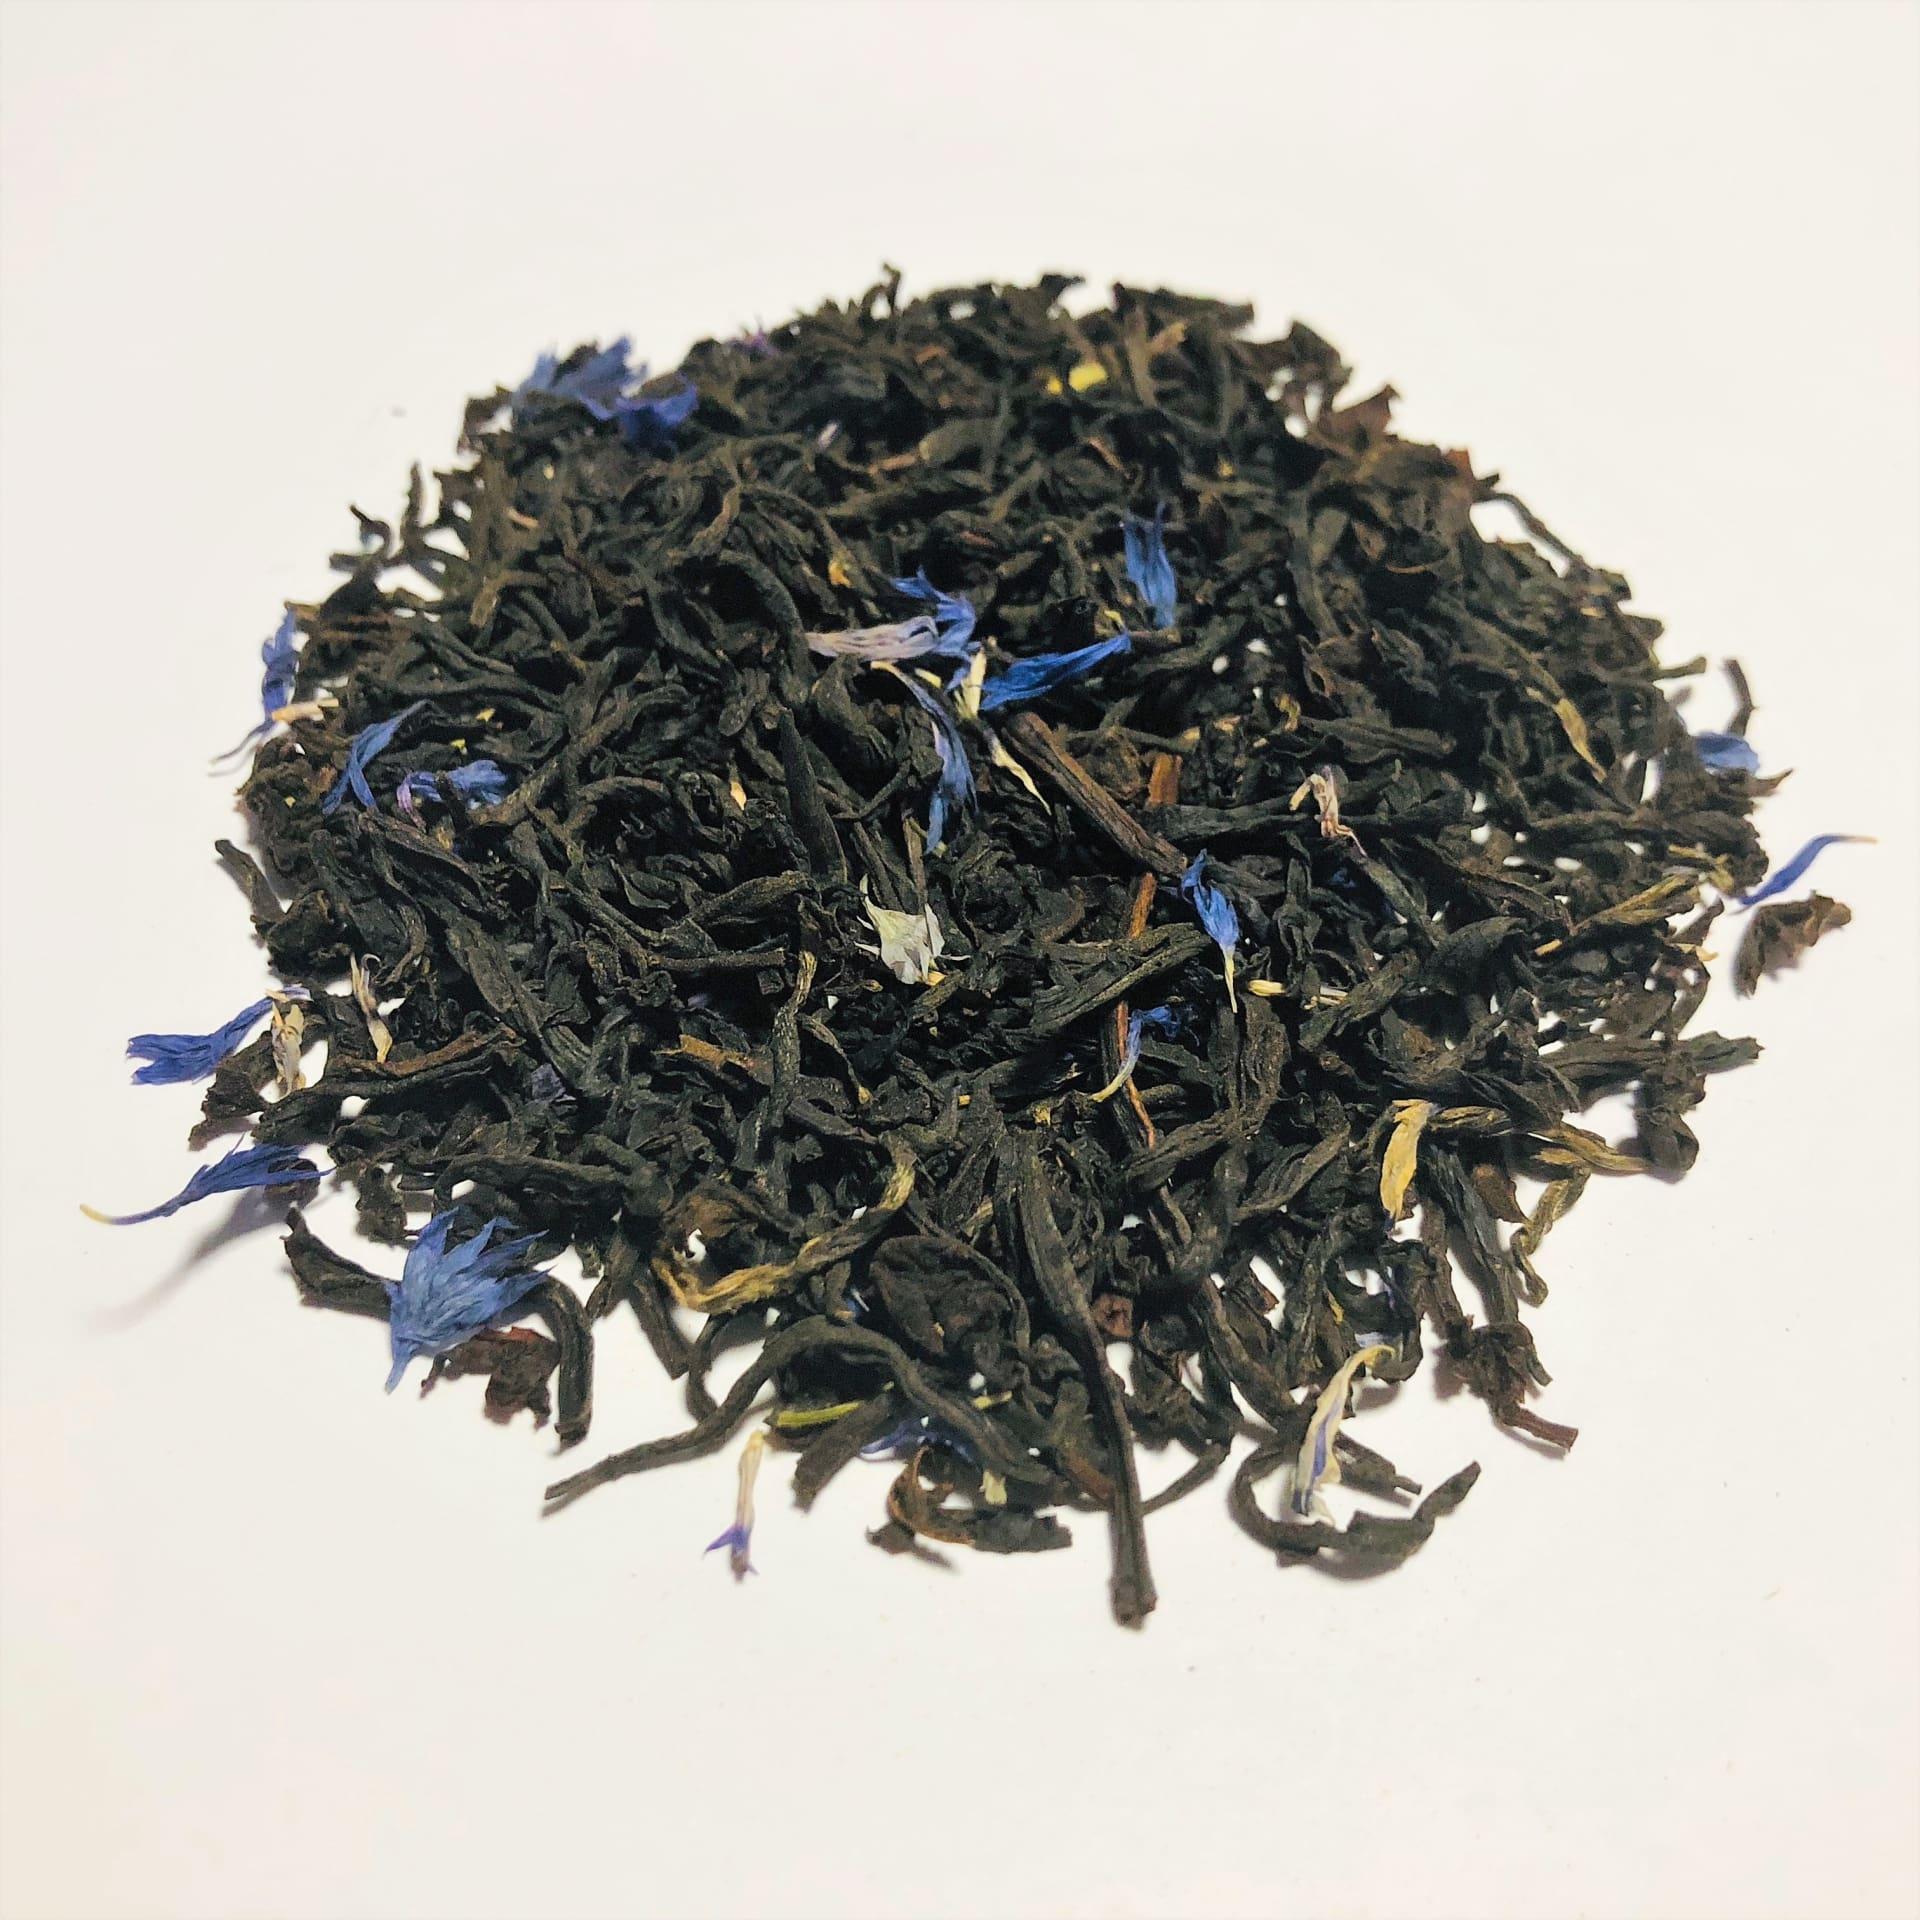 Blue Flower Earl Grey - Loose Leaf Tea